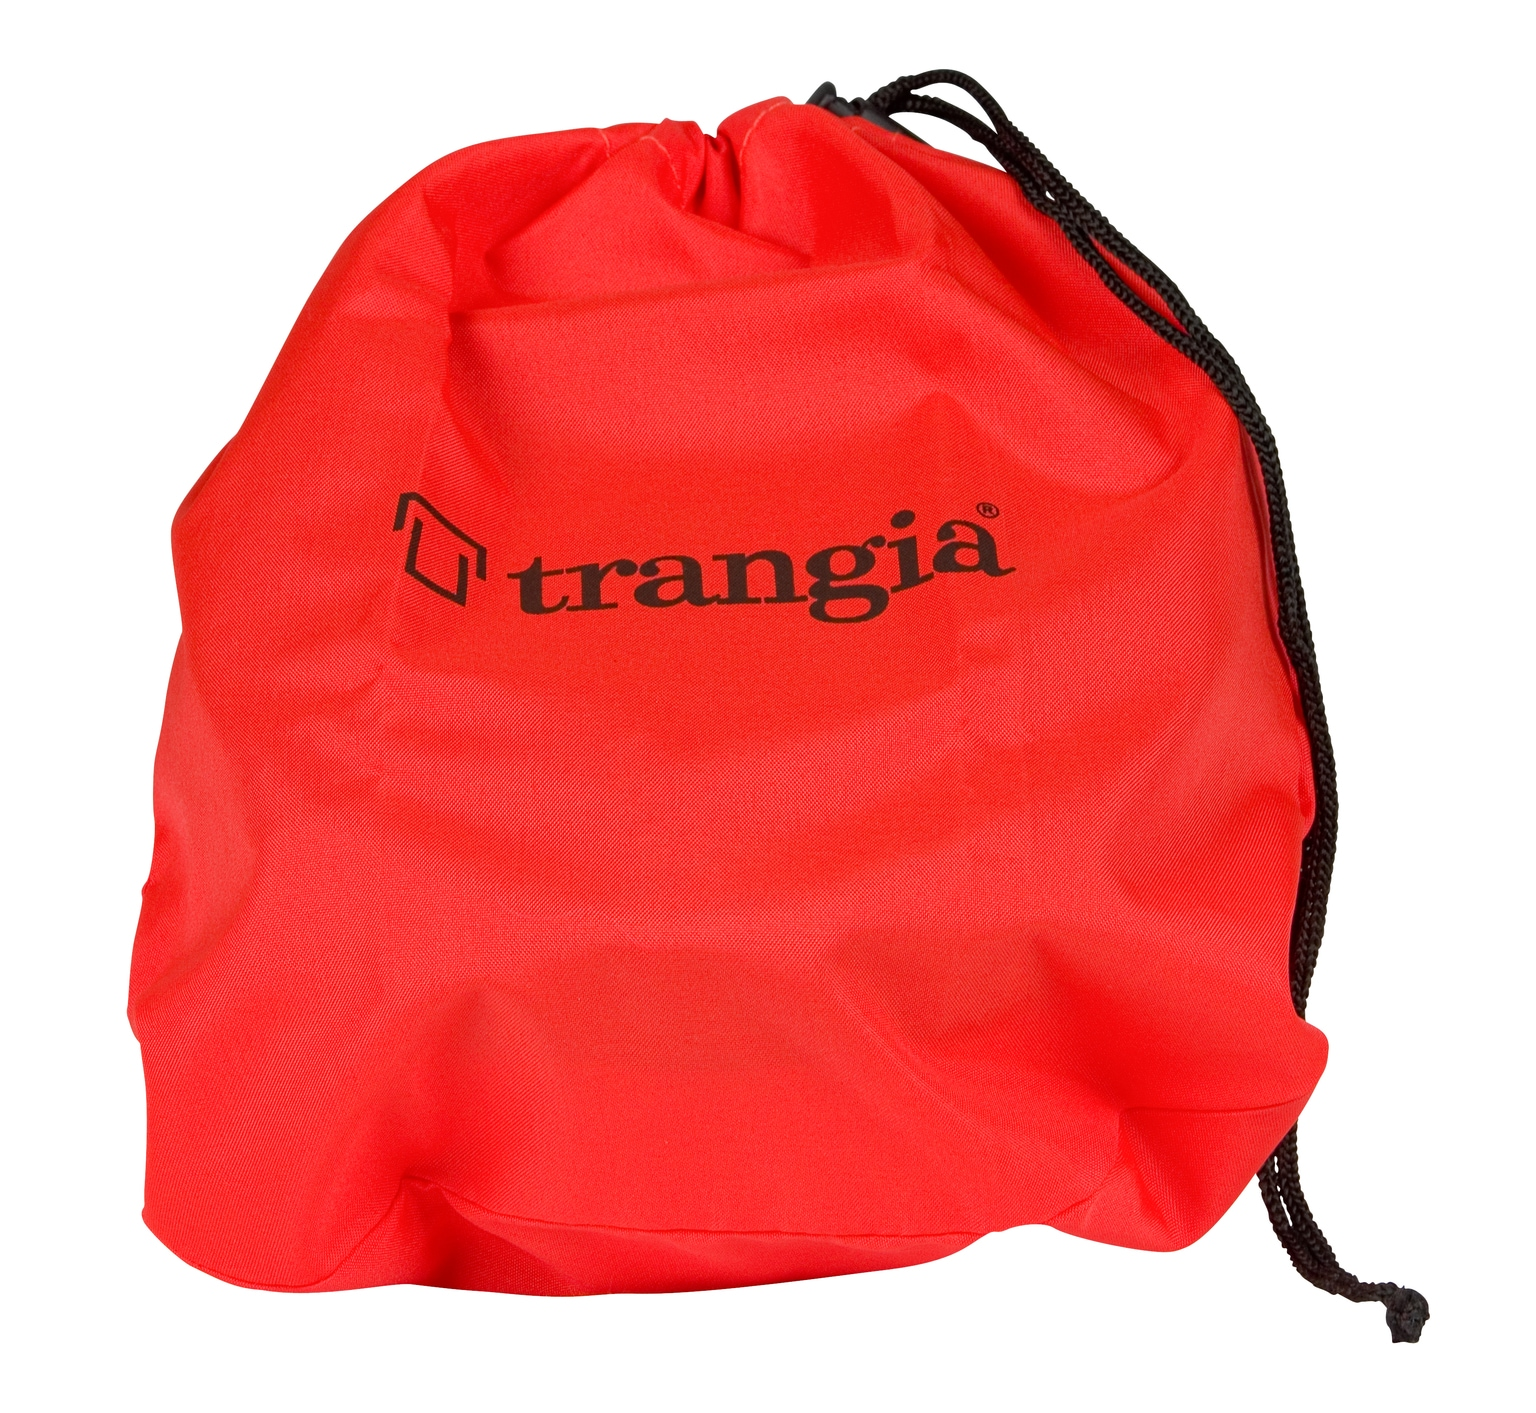 Trangia Overtrekkspose for 25-serien